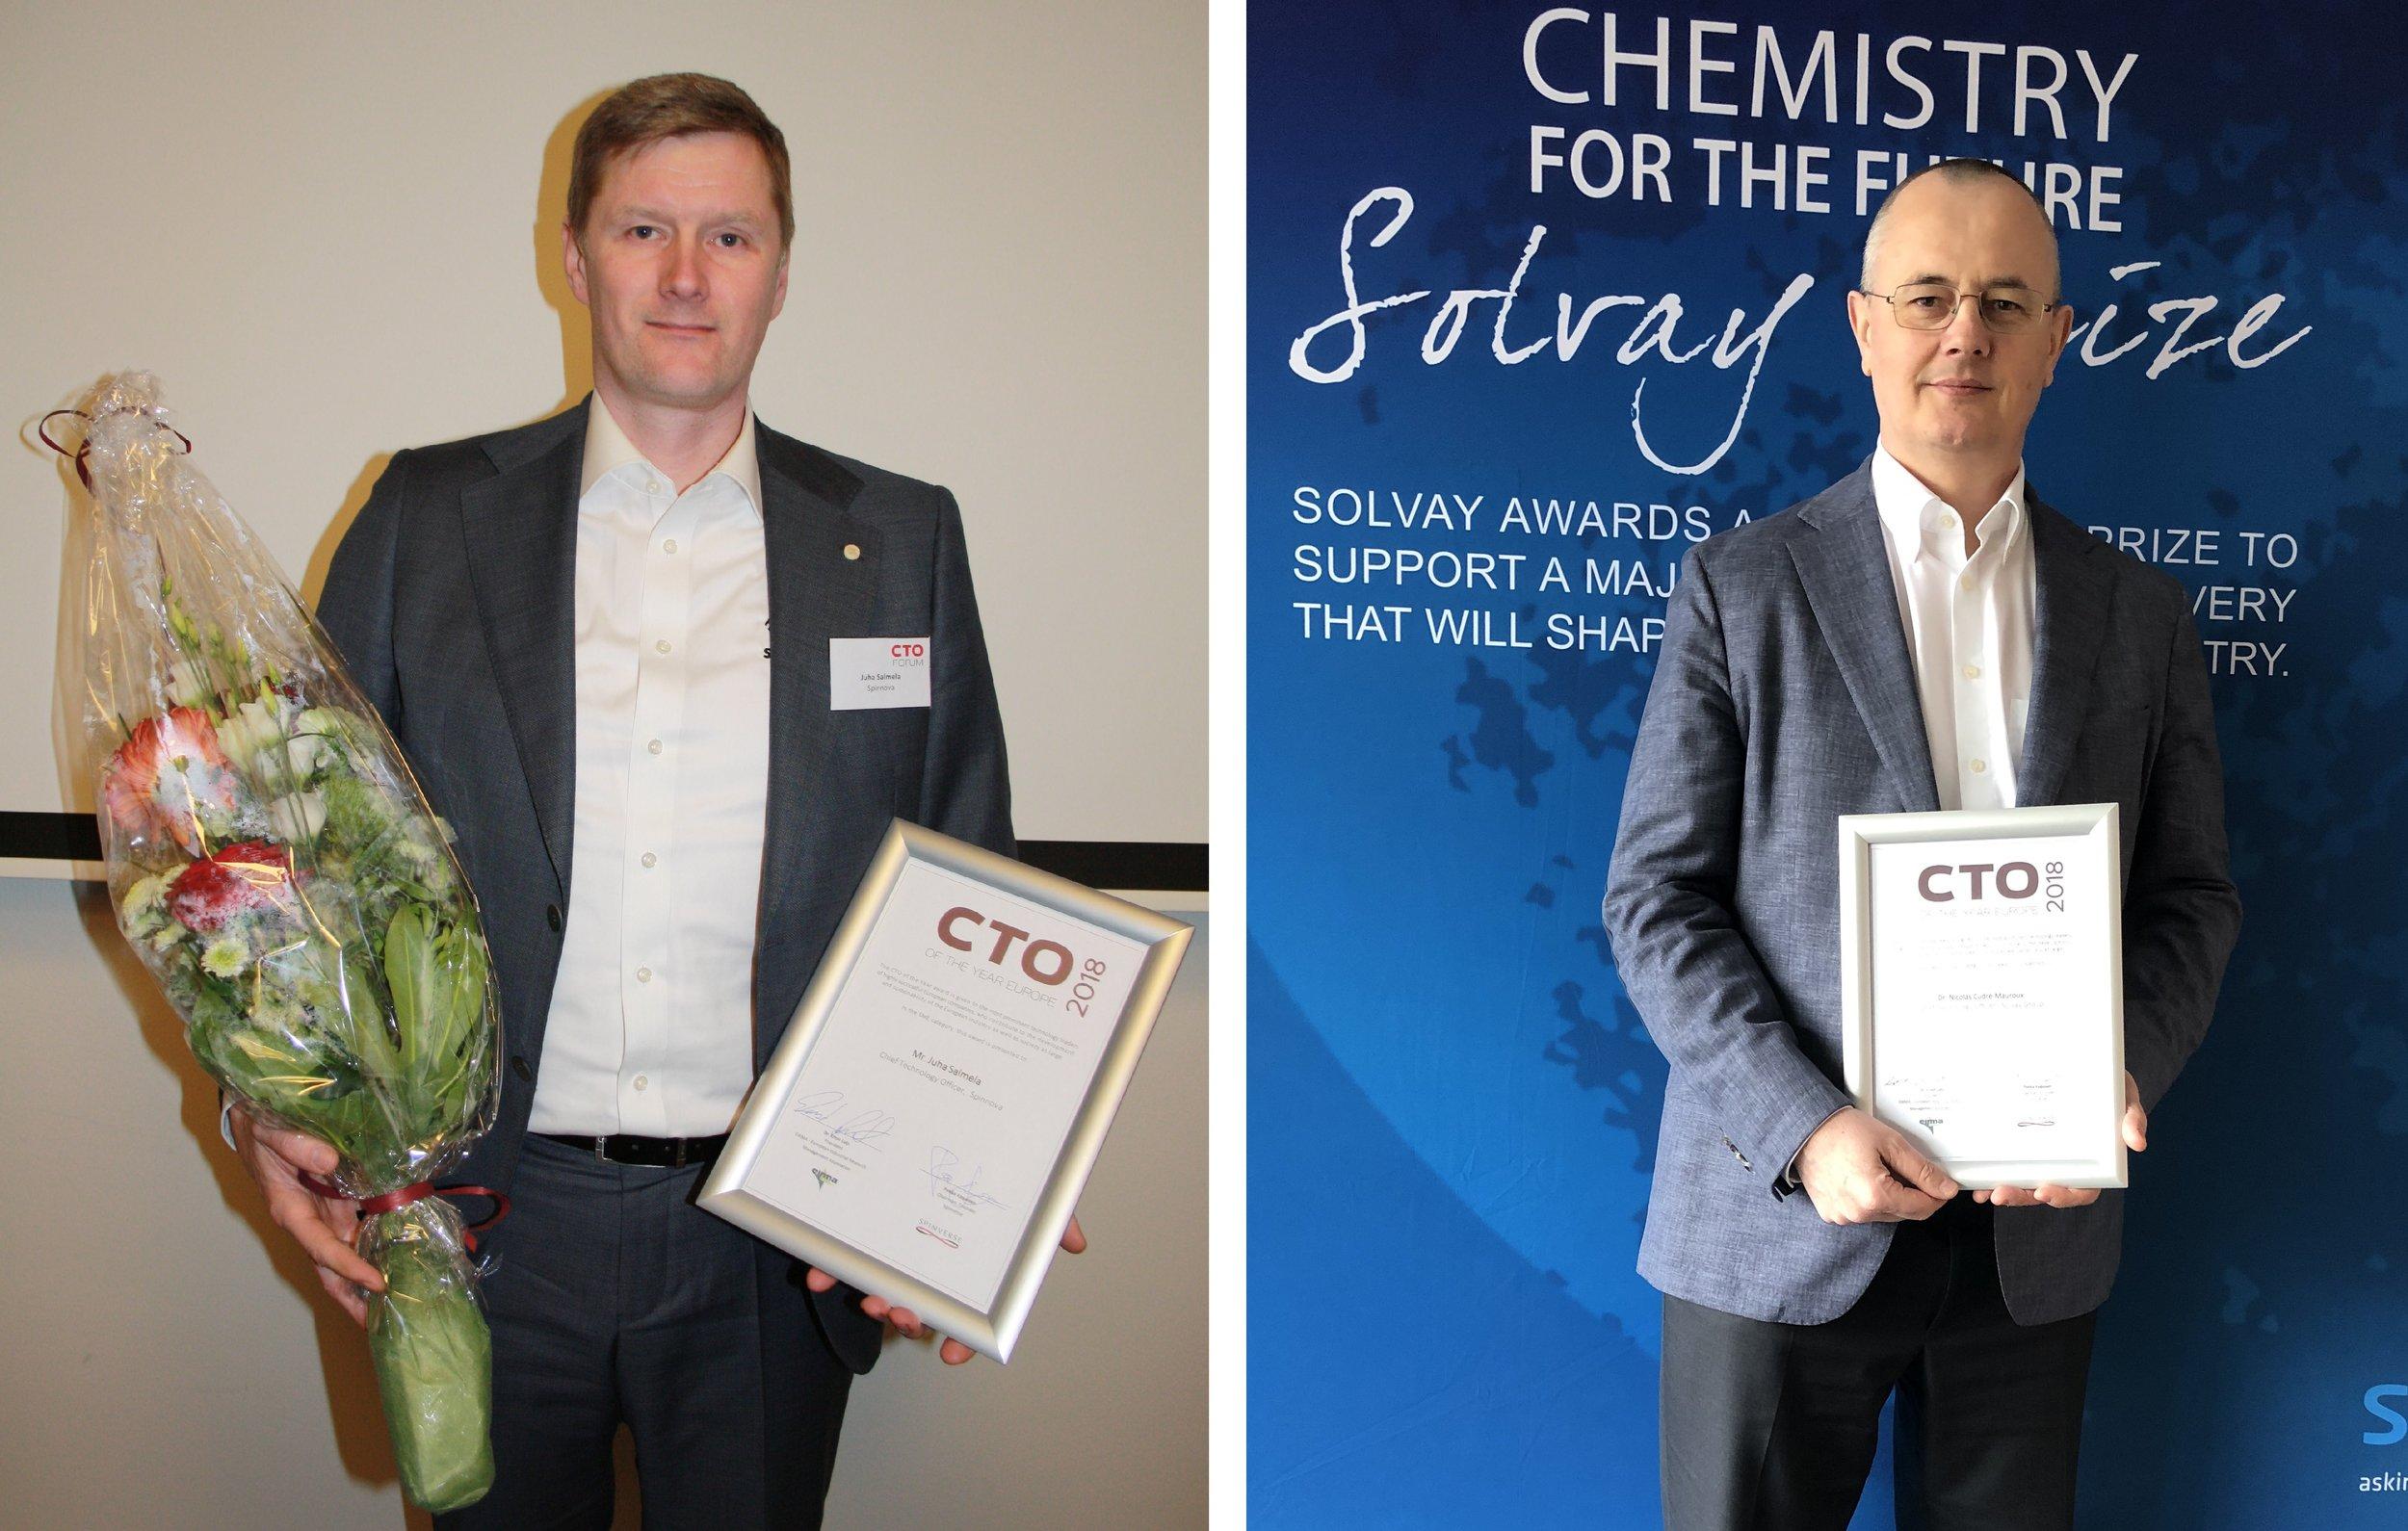 Juha Salmela (European CTO of the Year 2018, Spinnova) and Nicolas Cudré-Mauroux (European CTO of the Year 2018, Solvay)